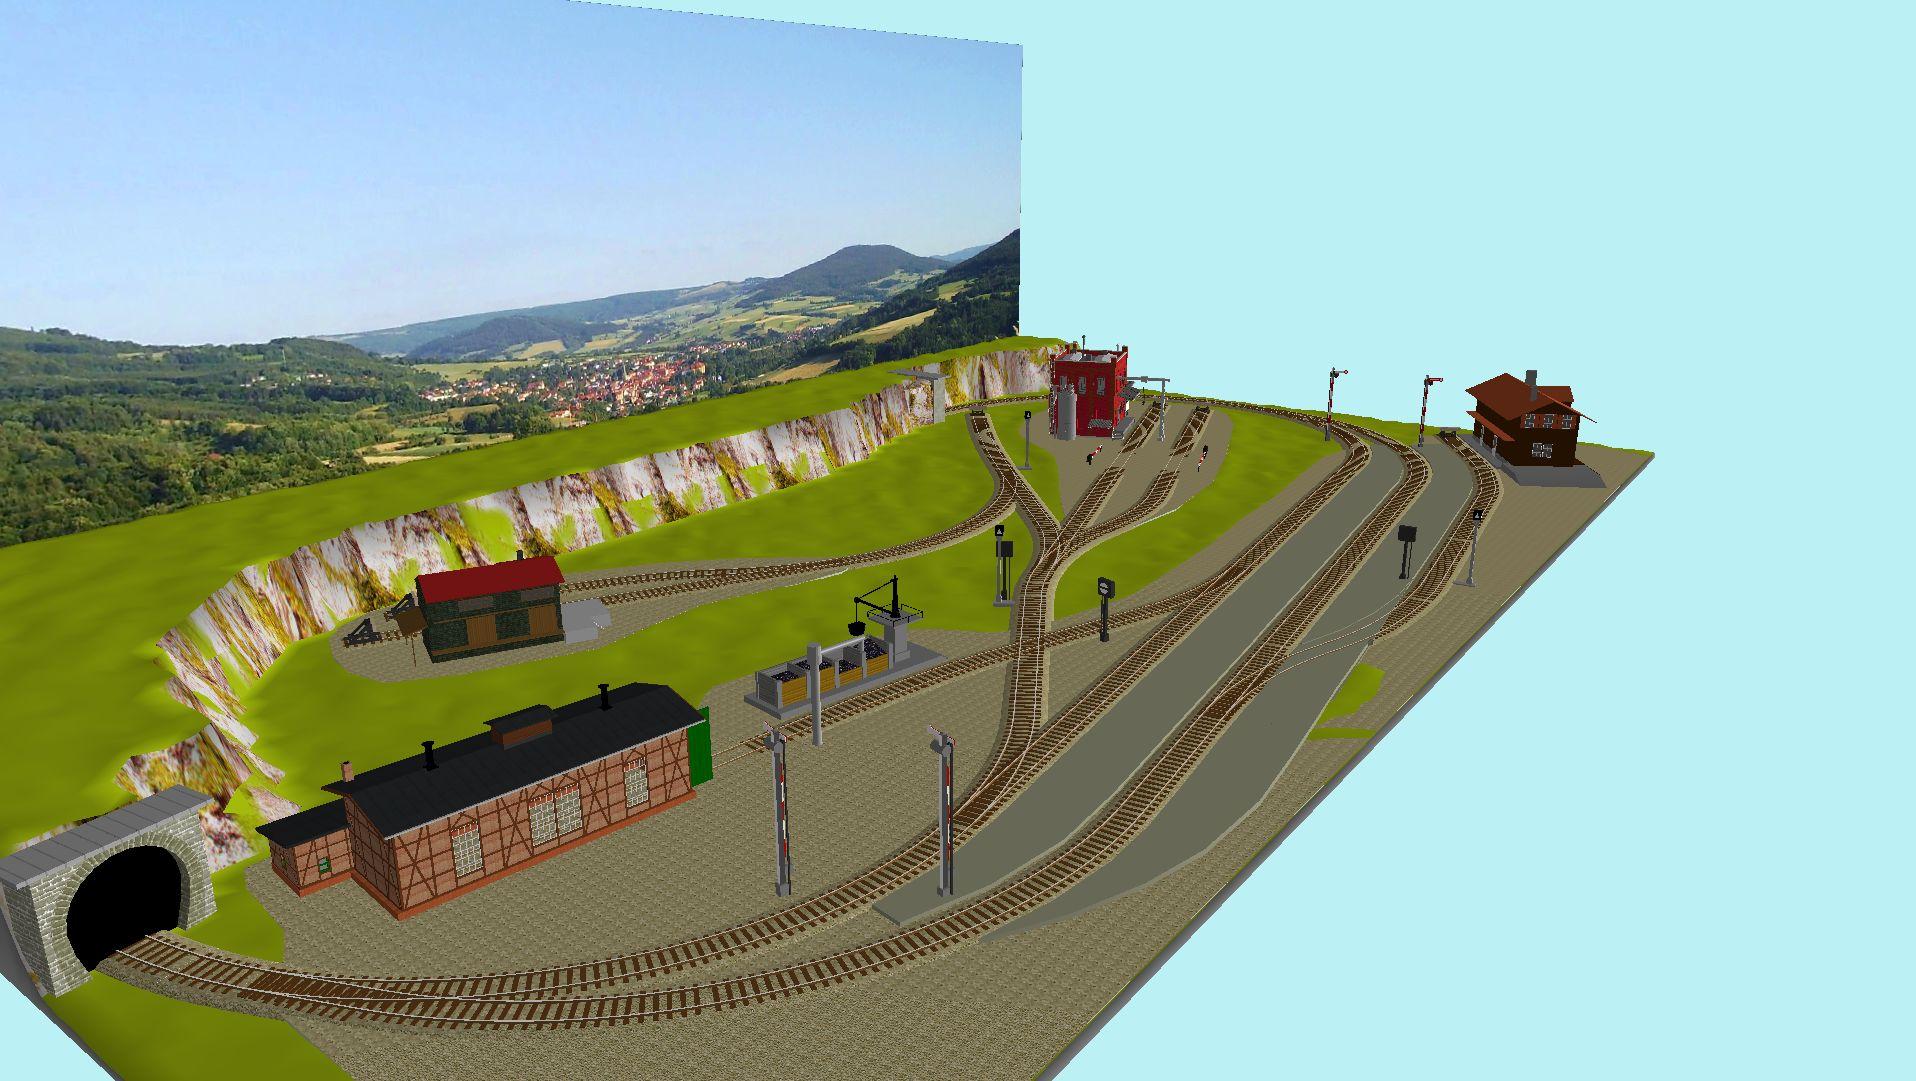 'ALBA Modellbahnpraxis' Band 1, Plan 5 Amp-1_5_m-gleis_314jhx